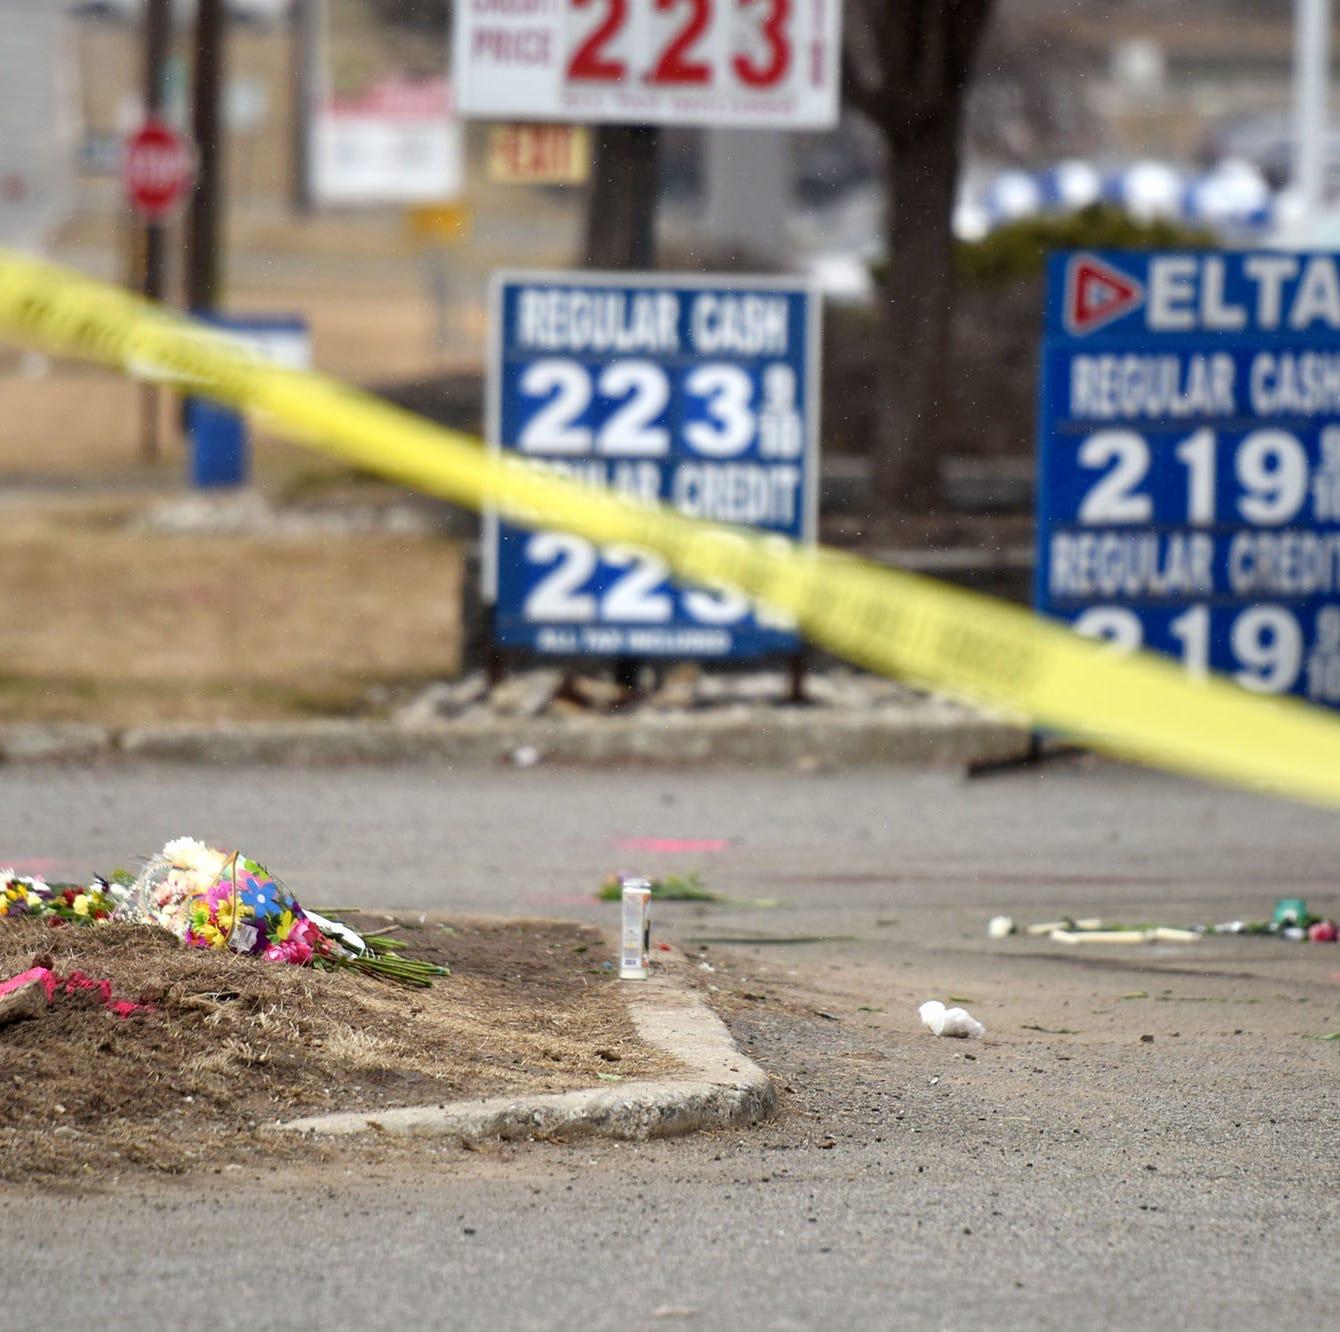 Gas station attendant killed in Wayne crash was set to leave job in 2 weeks